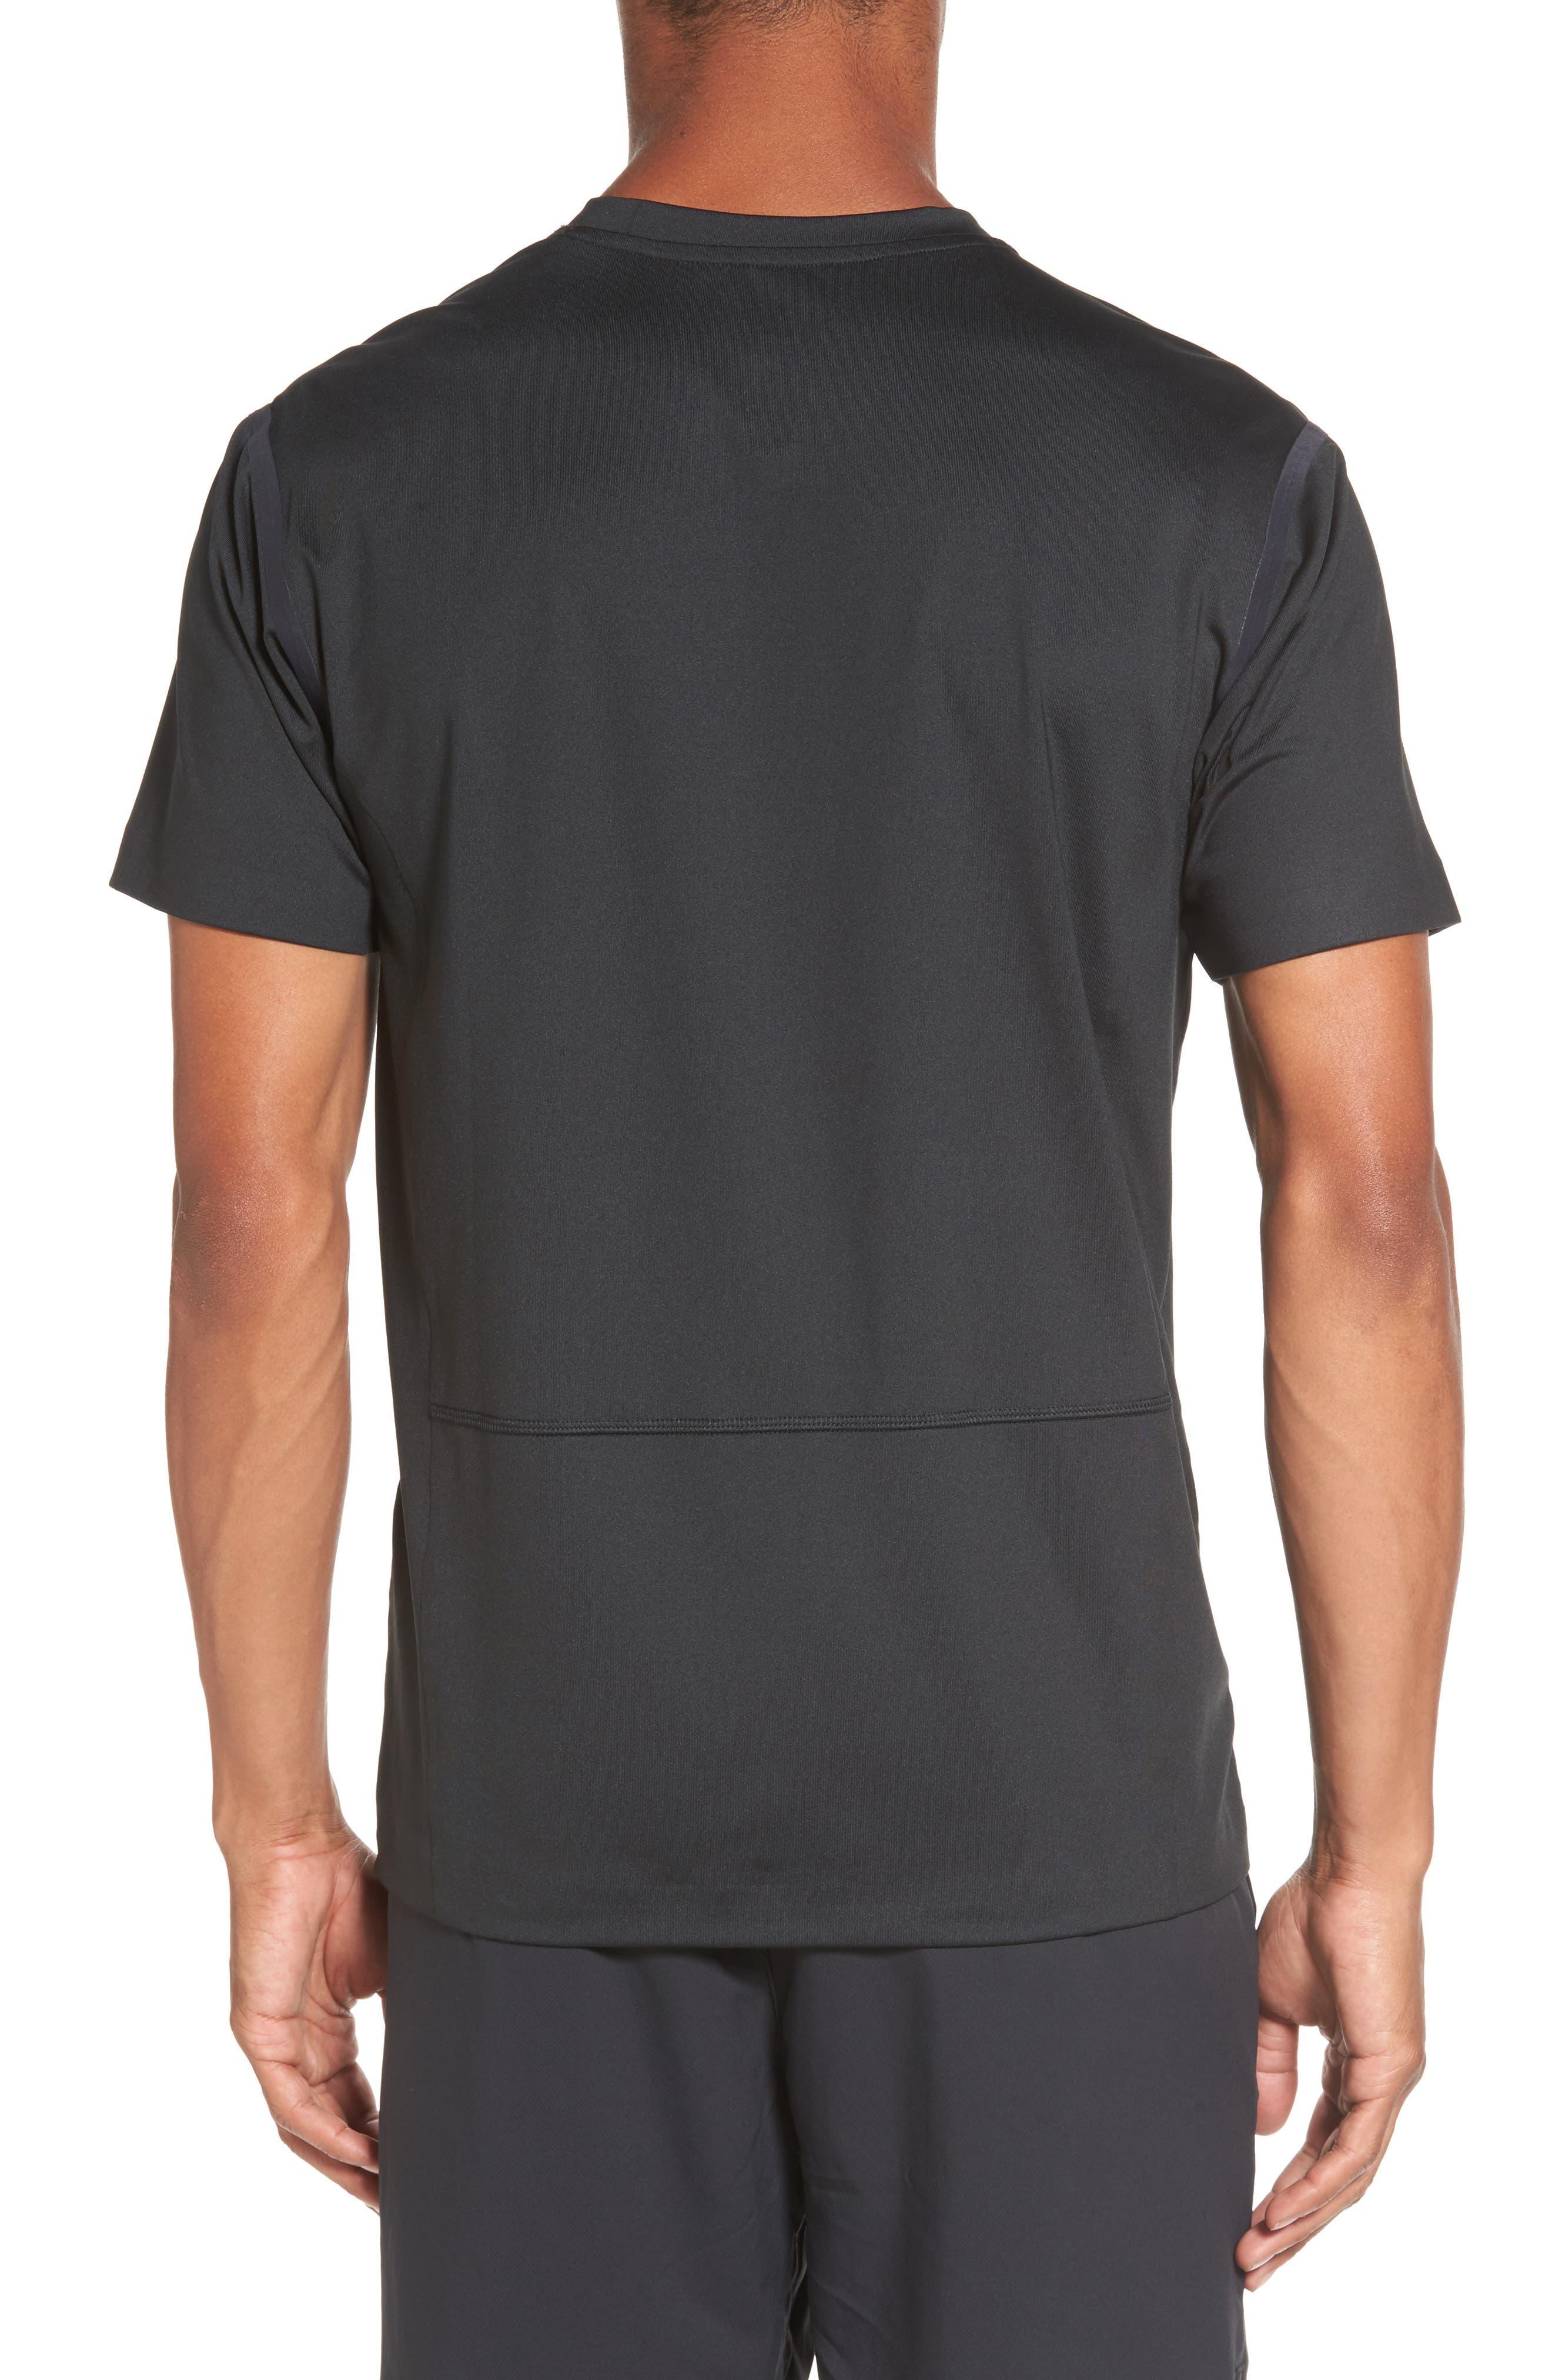 VA Compression T-Shirt,                             Alternate thumbnail 2, color,                             001